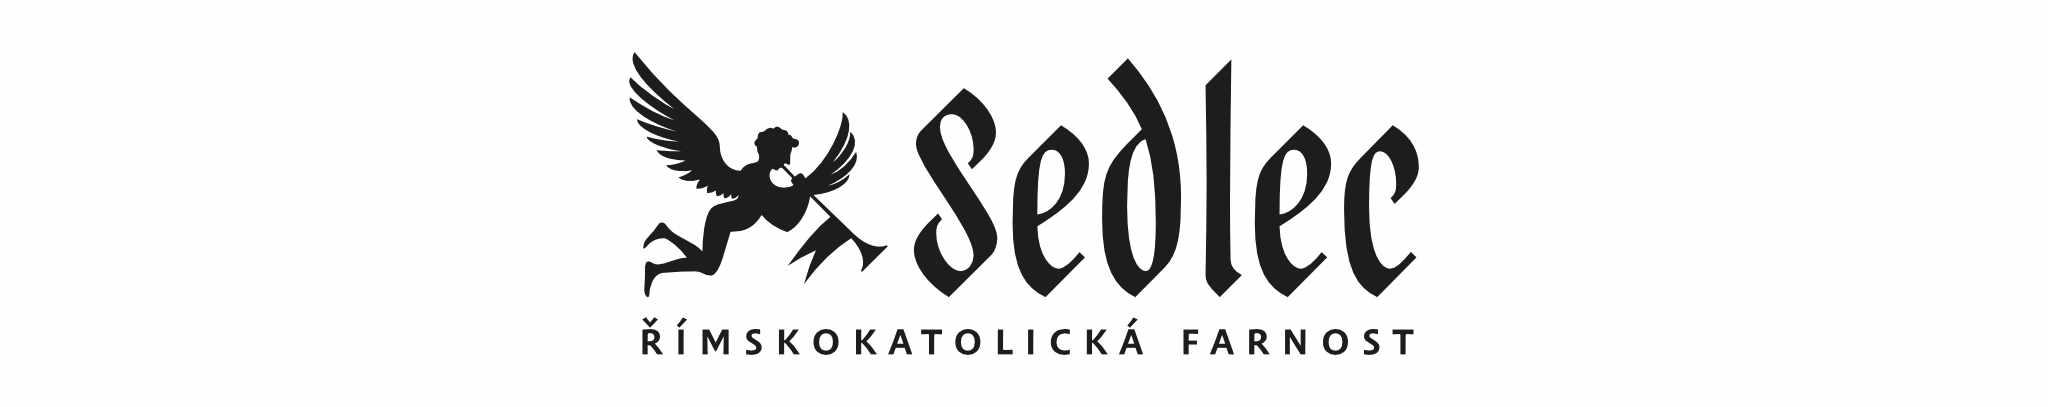 sedlec-logo